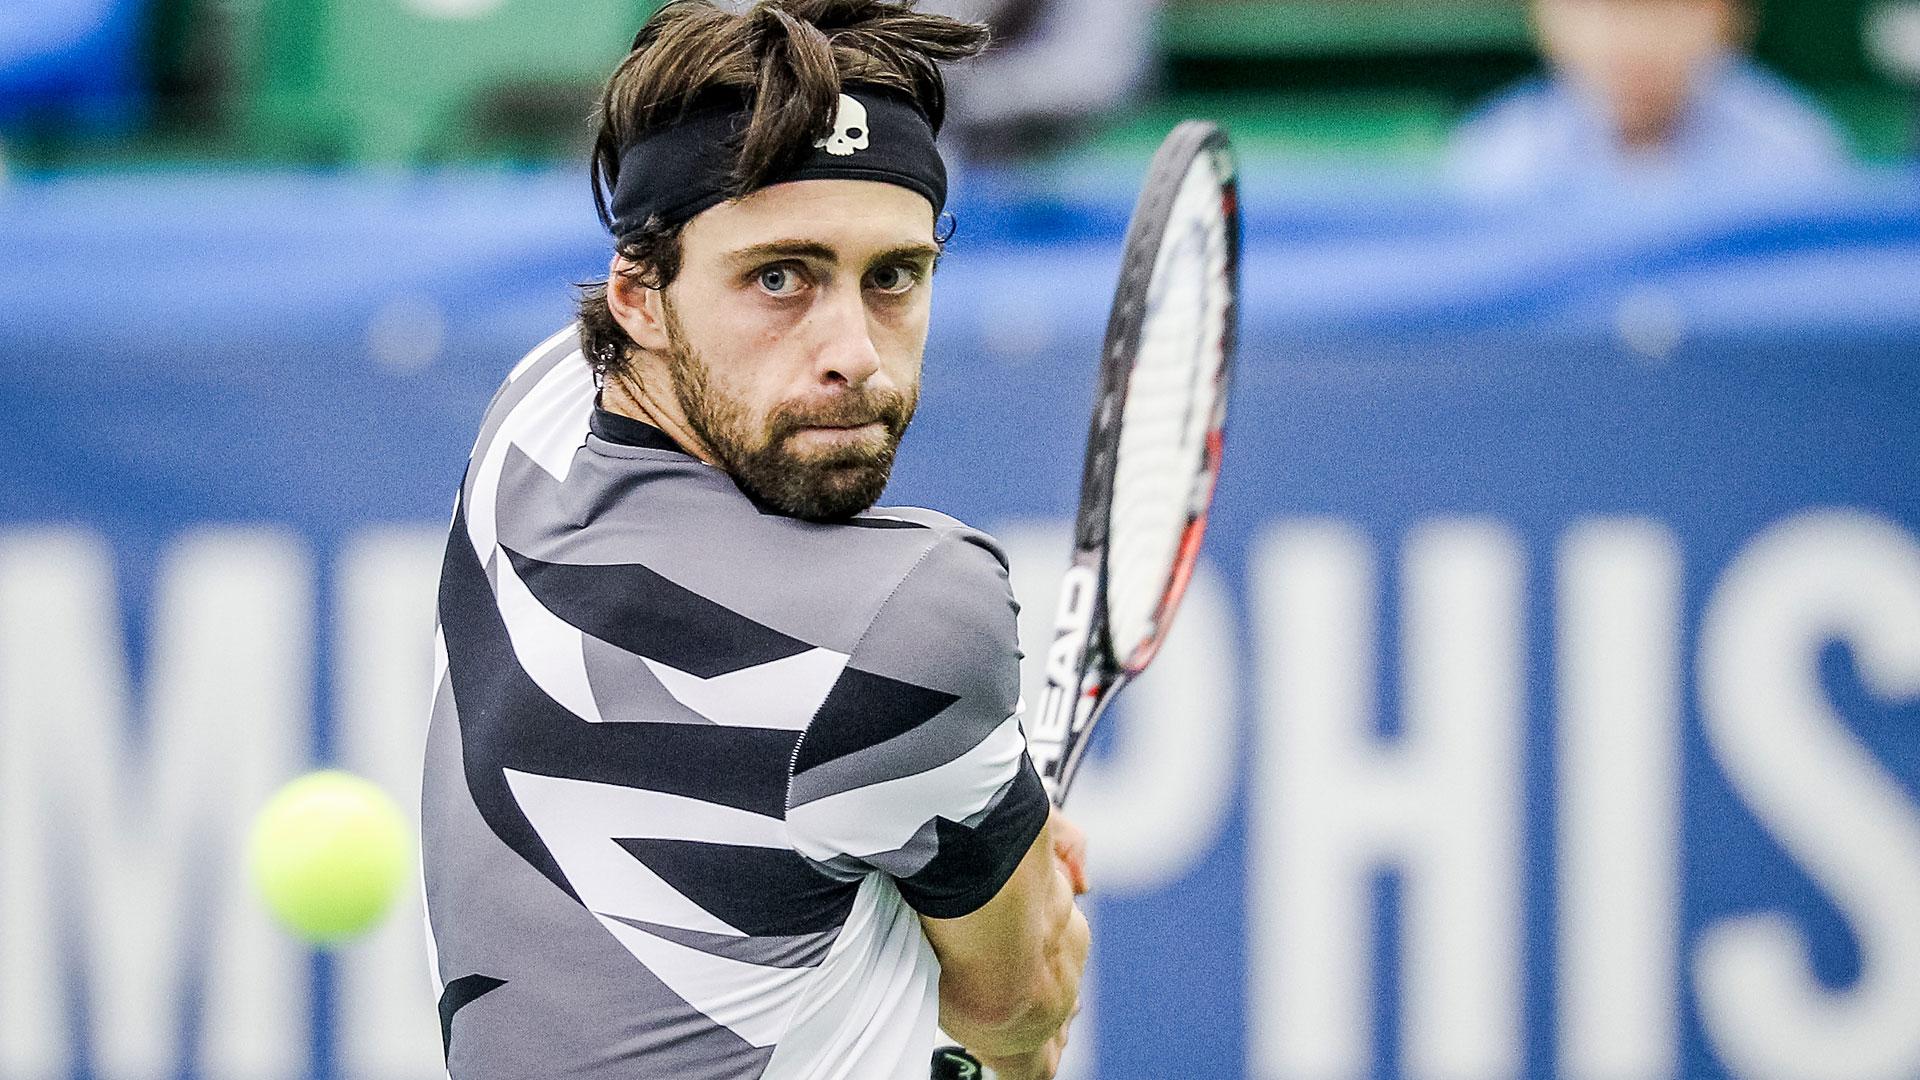 Nikoloz Basilashvili #новости грузинский теннисист, Николоз Басилашвили, Ролан Гаррос